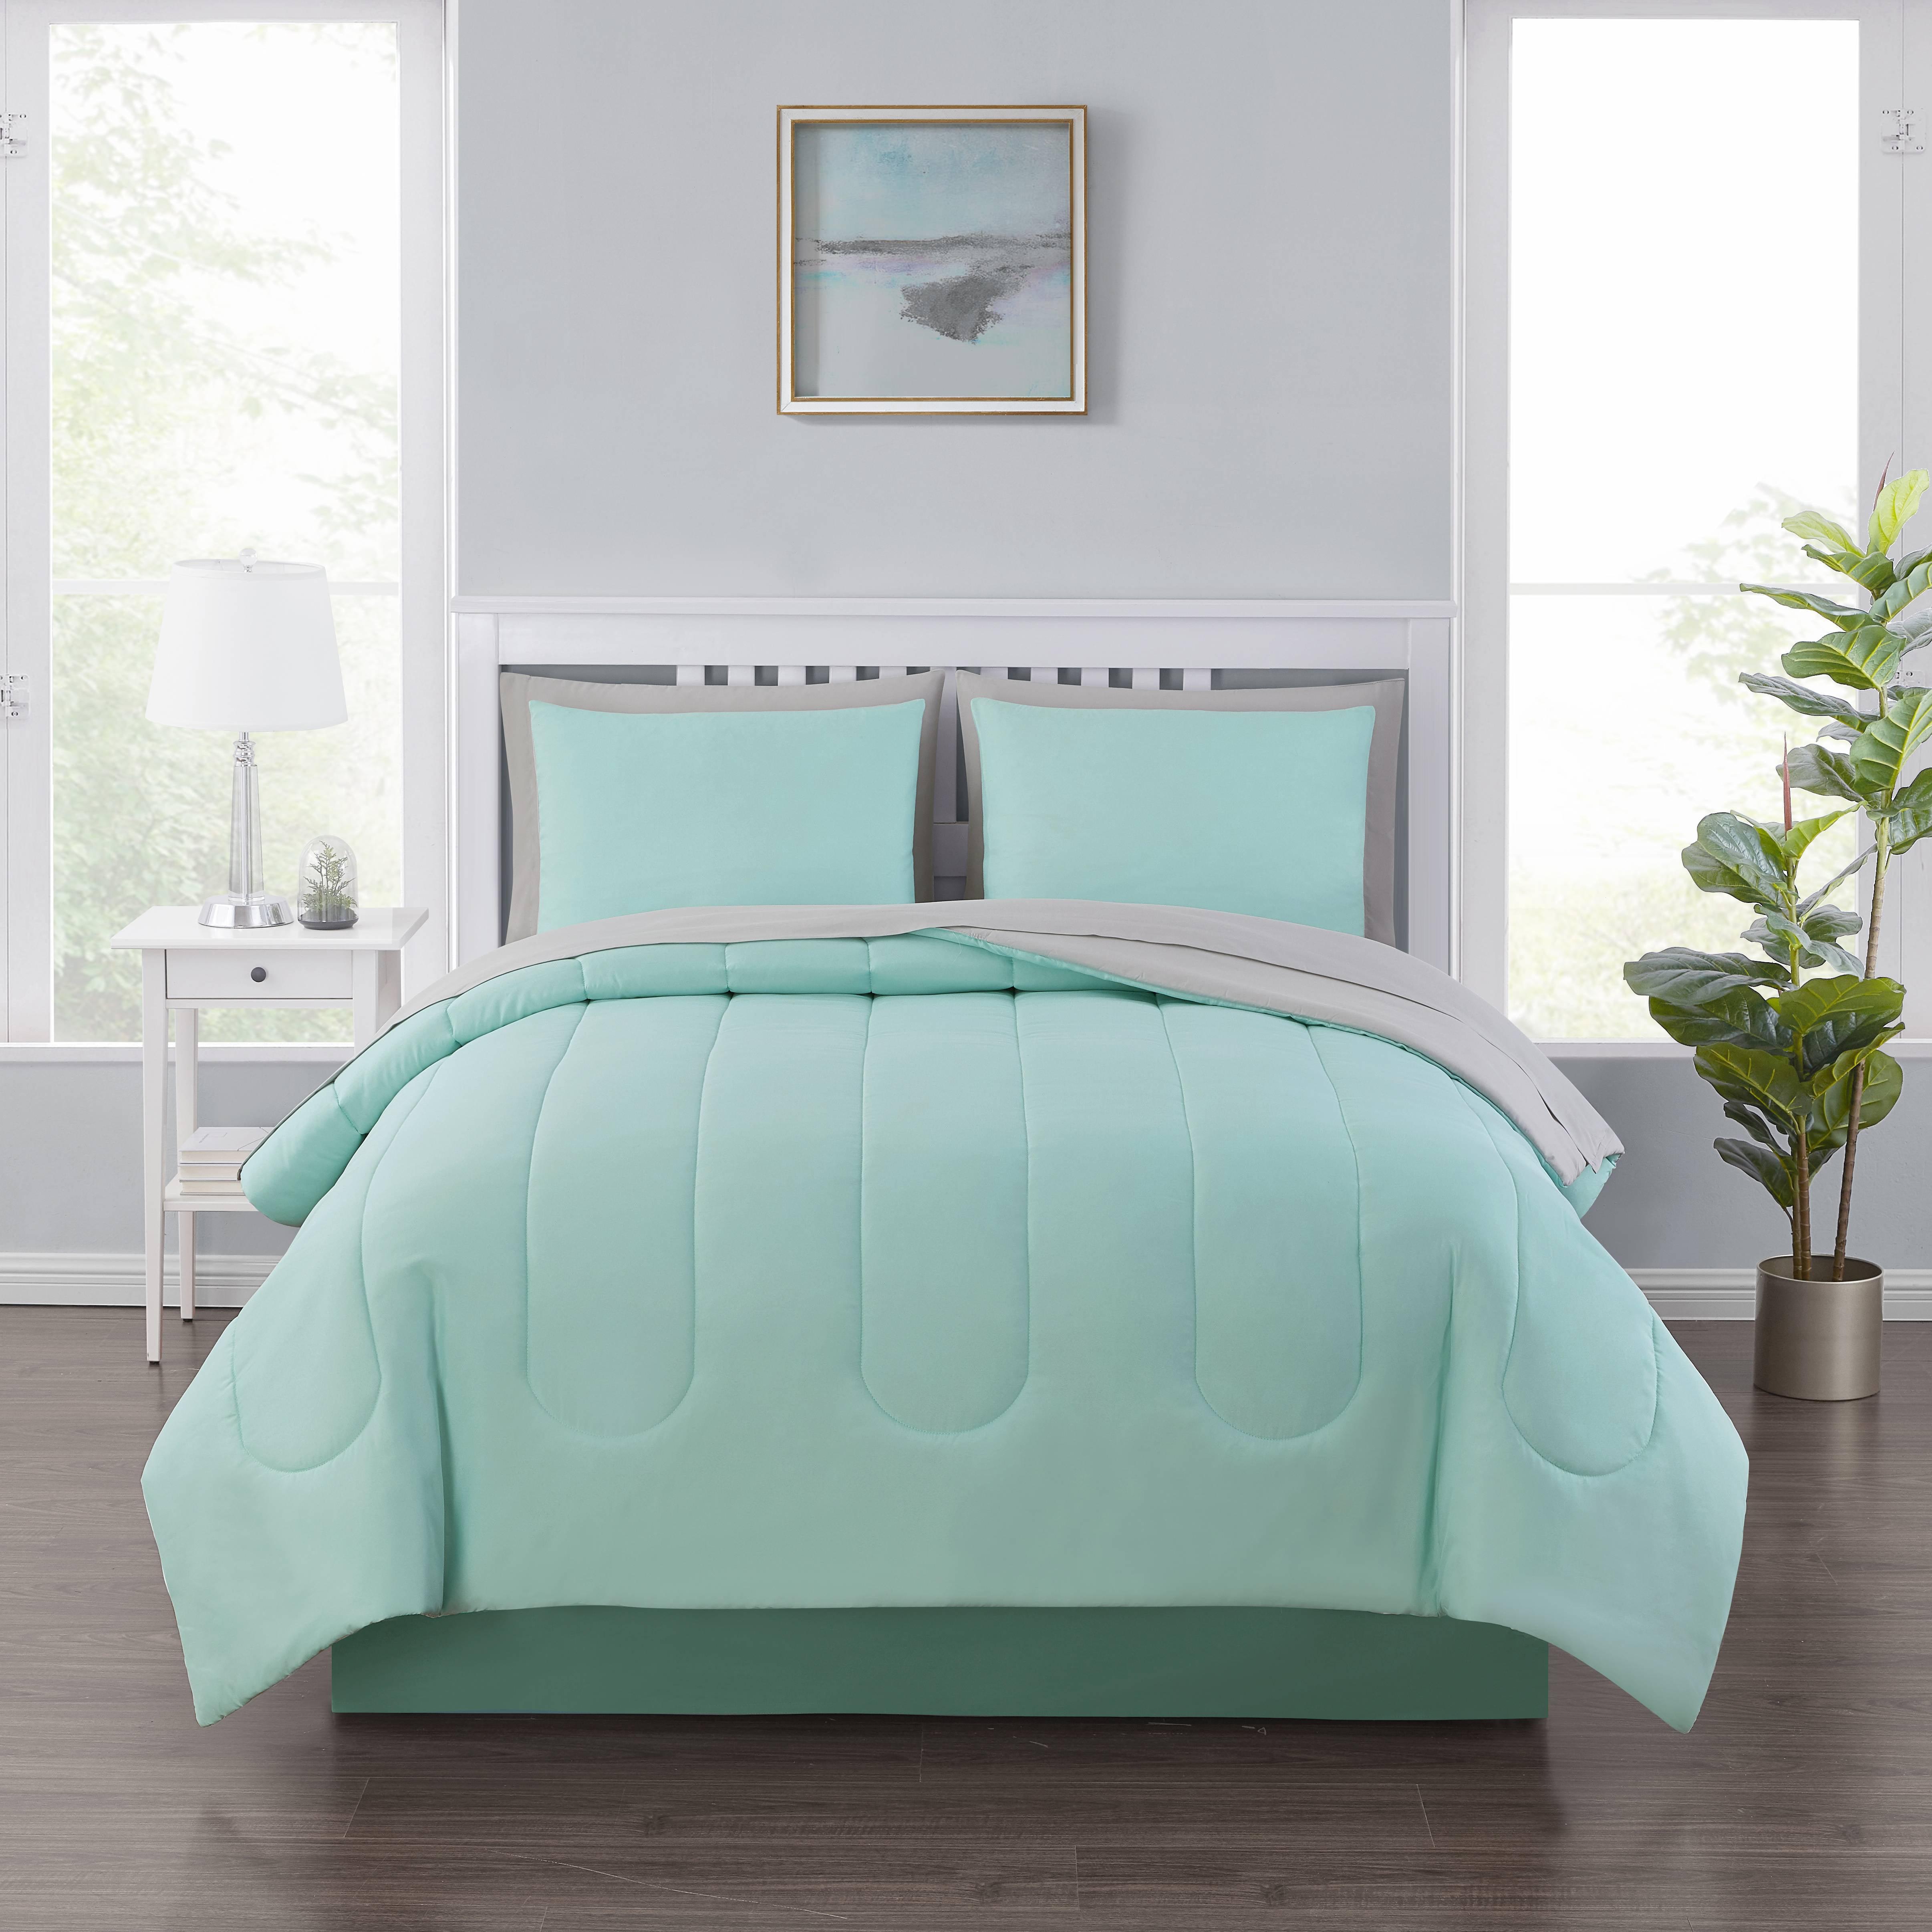 Mainstays Solid Mint 6 Piece Bed In A Bag Bedding Set Twin Walmart Com Walmart Com